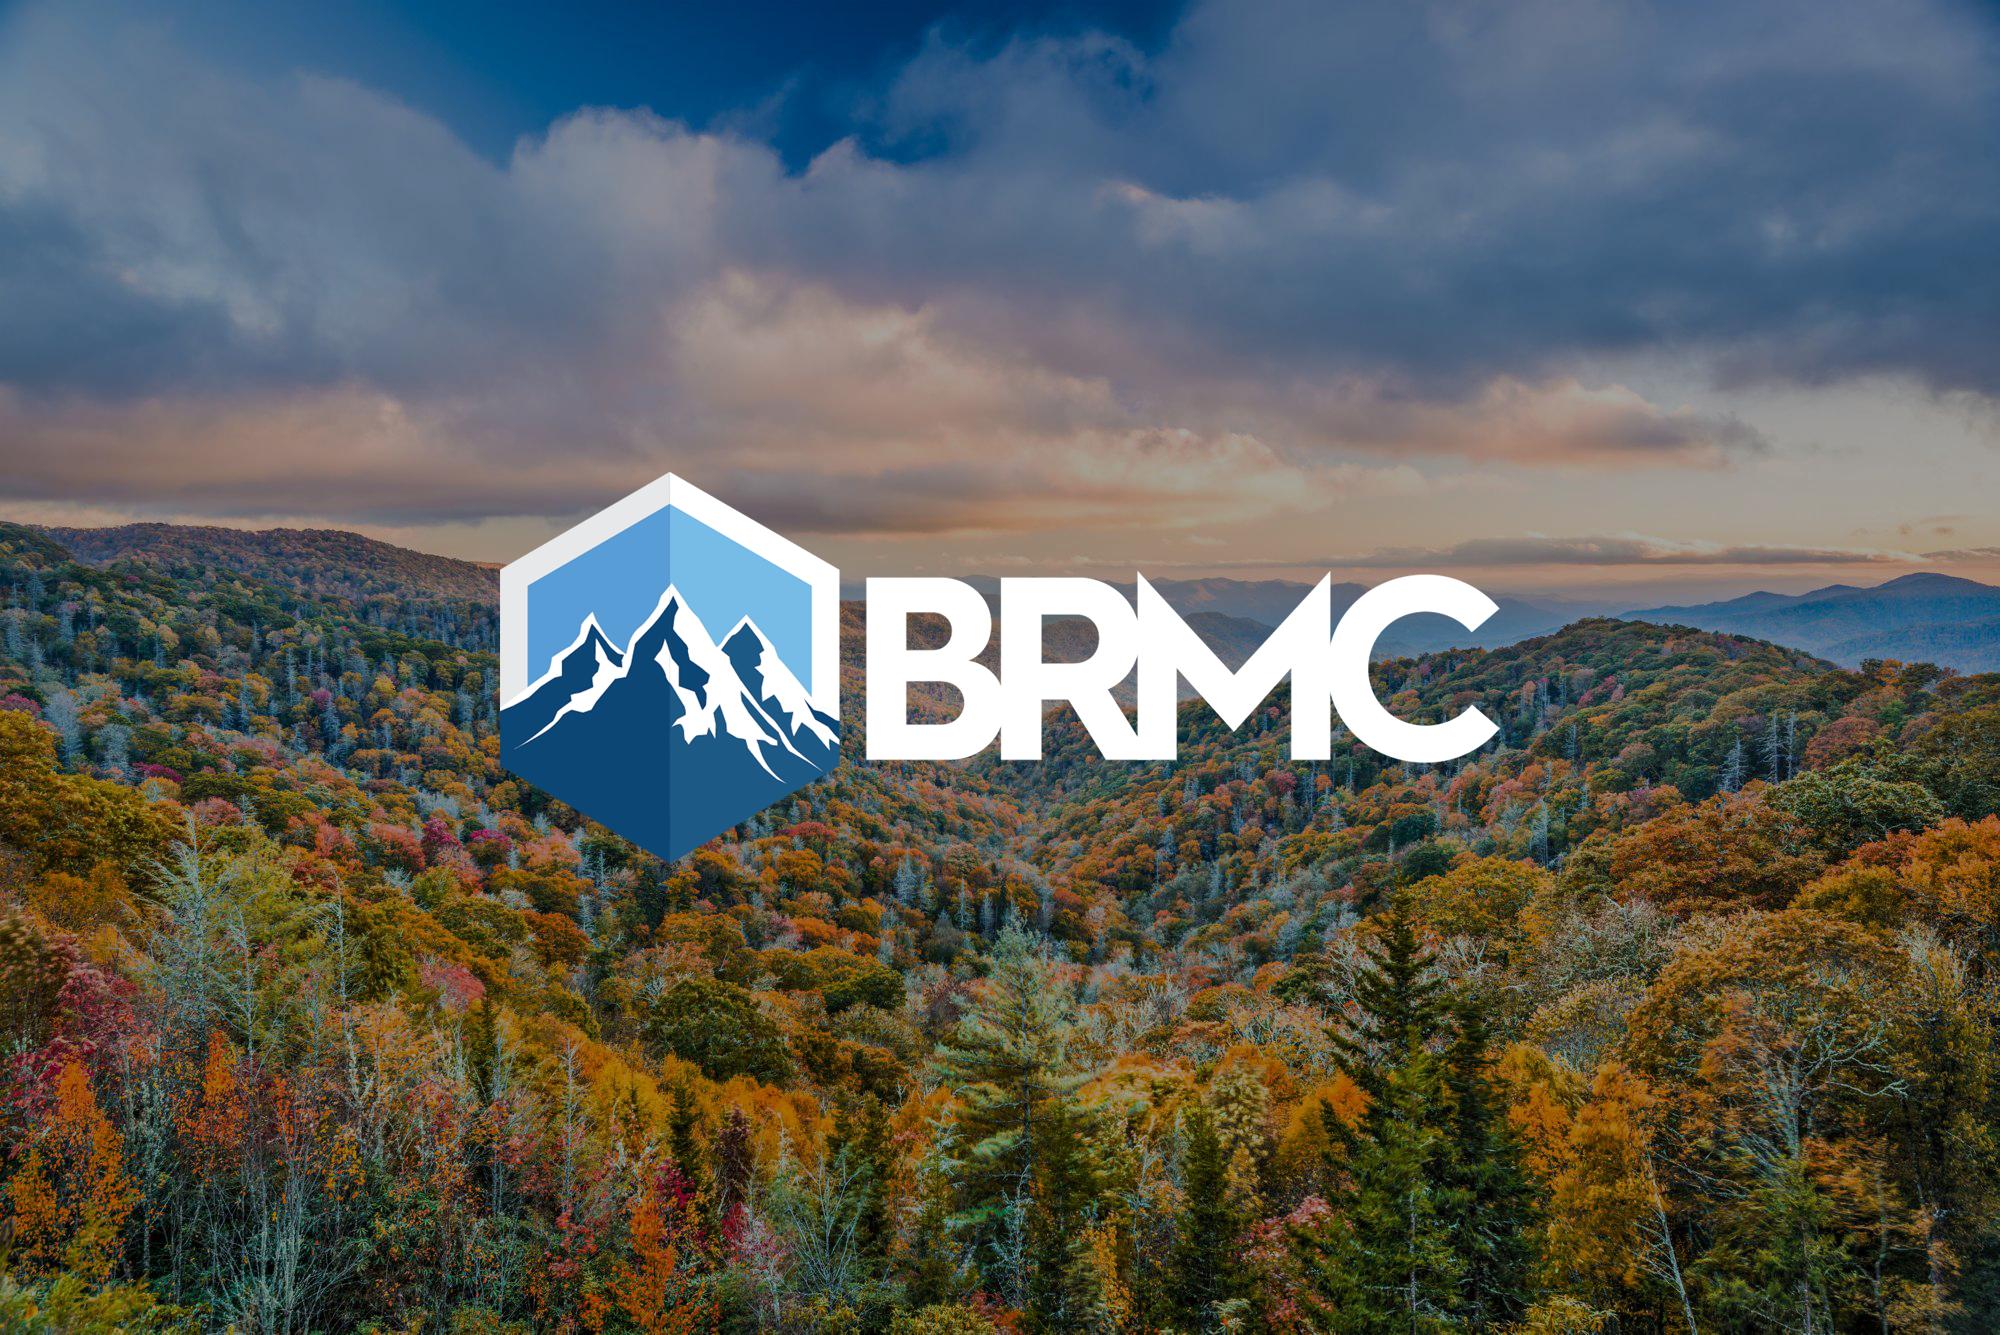 BRMC logo on scenic background